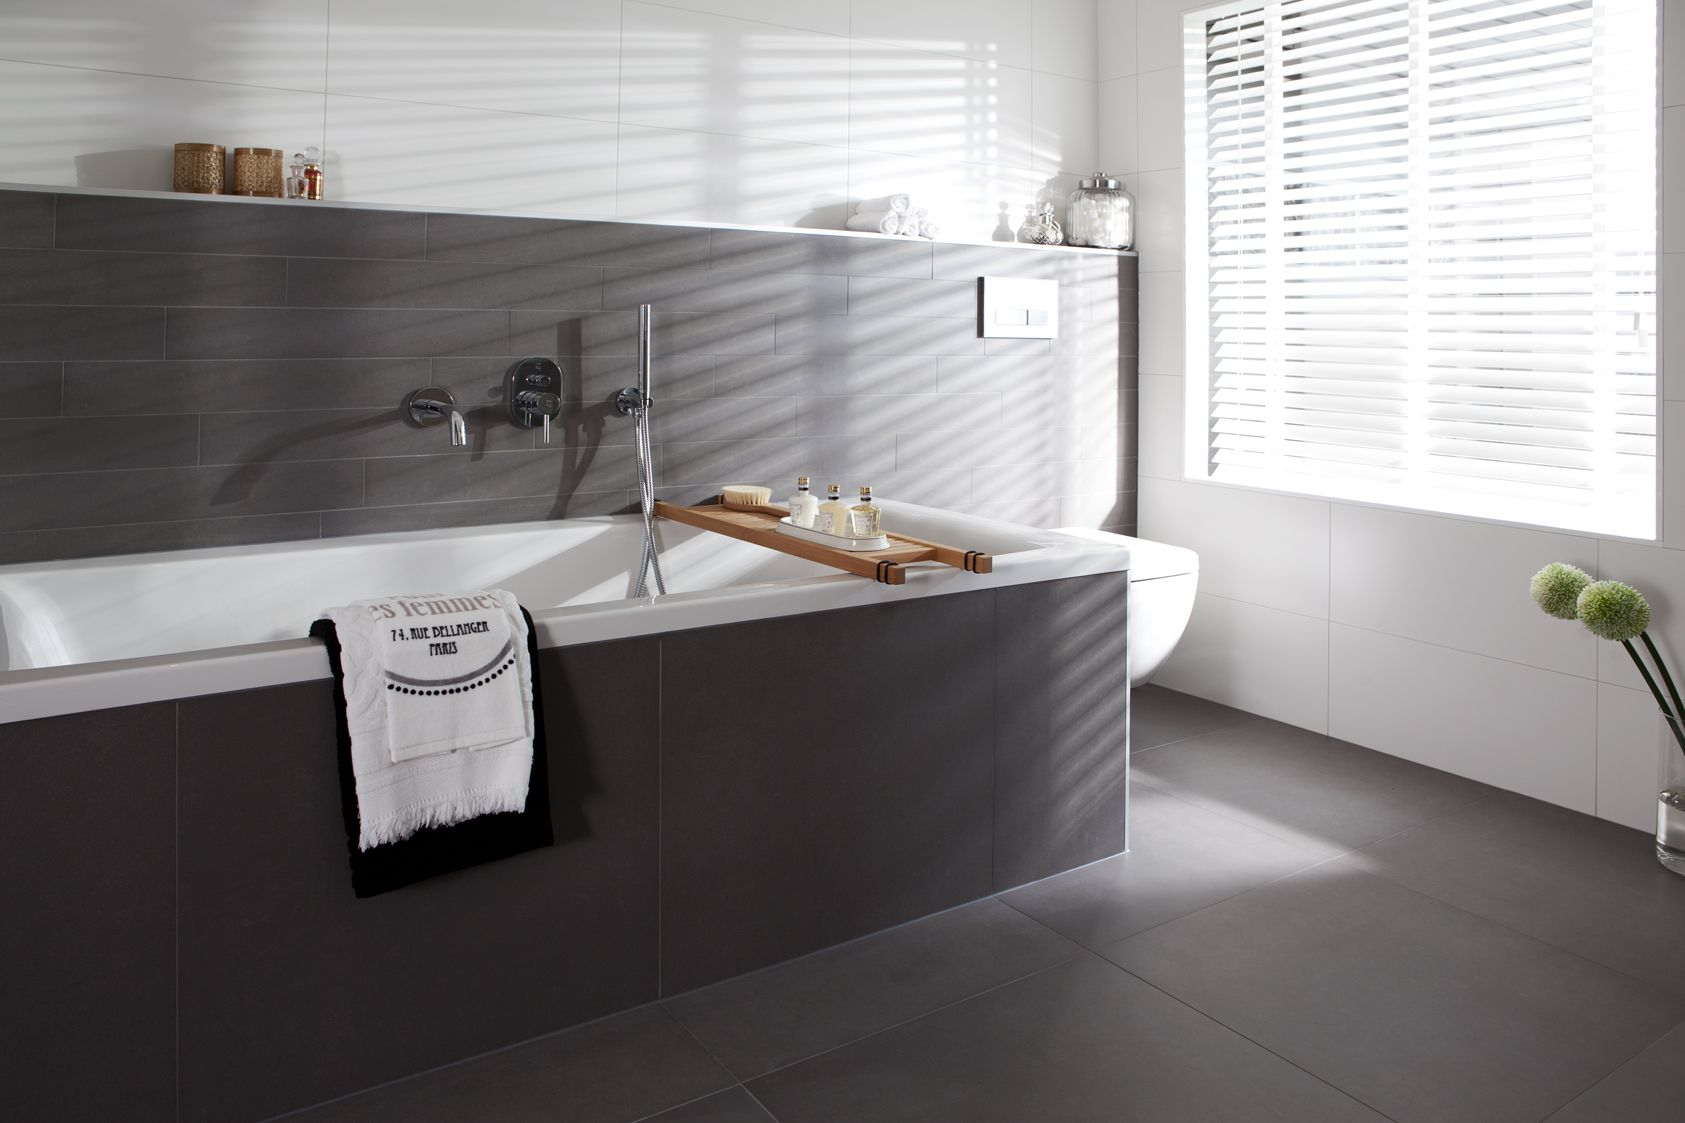 Badkamer Bad Afmetingen : Badkamer half betegelen modern nlfunvit badkamer bad afmetingen